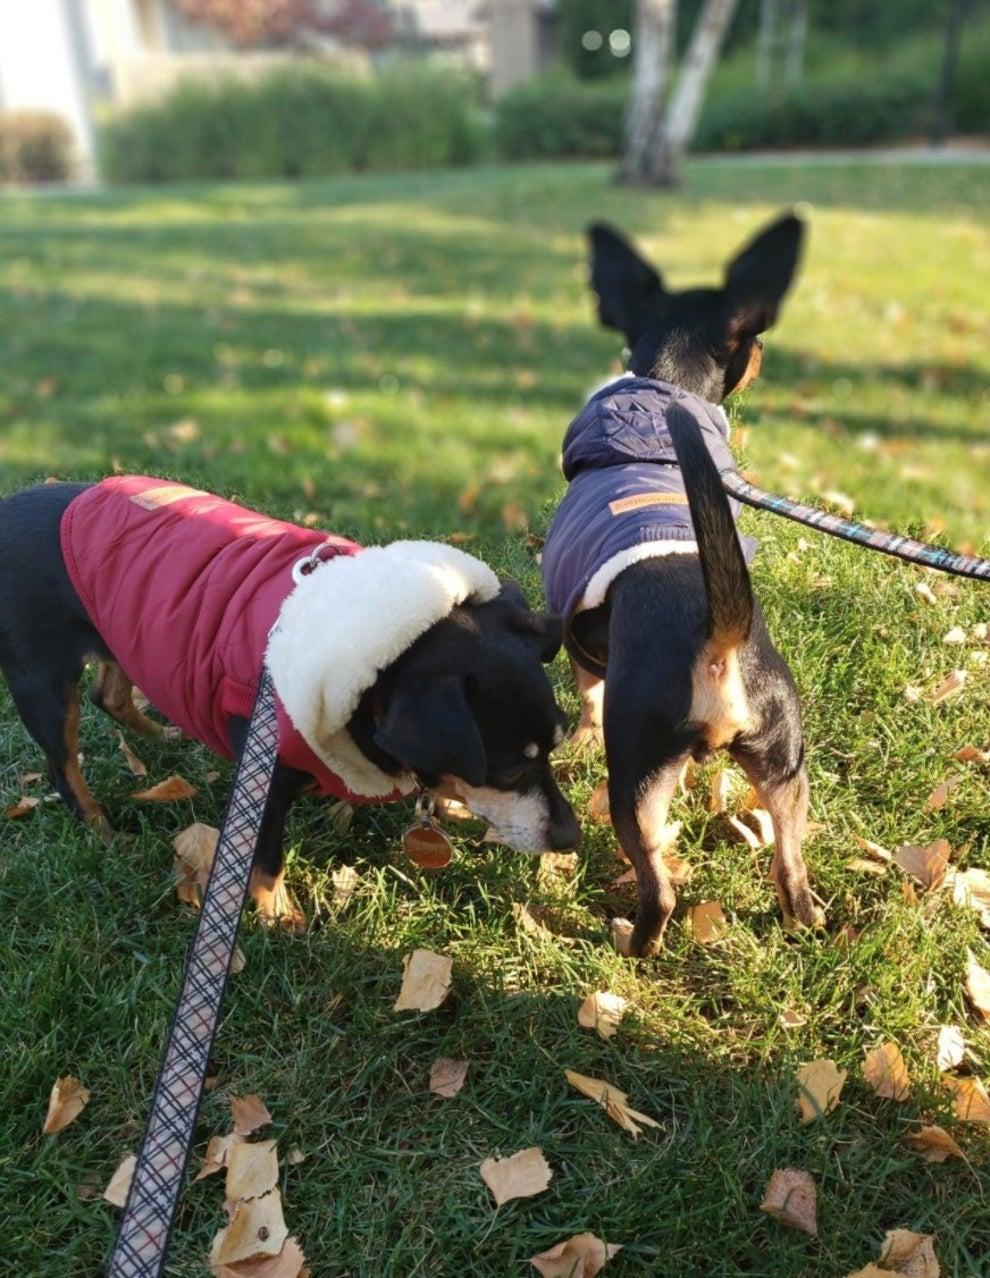 MEDIUM CANCER BANDANA small dog clothes small dog collars small dog toys toys for dogs medium dog clothes medium dog collars